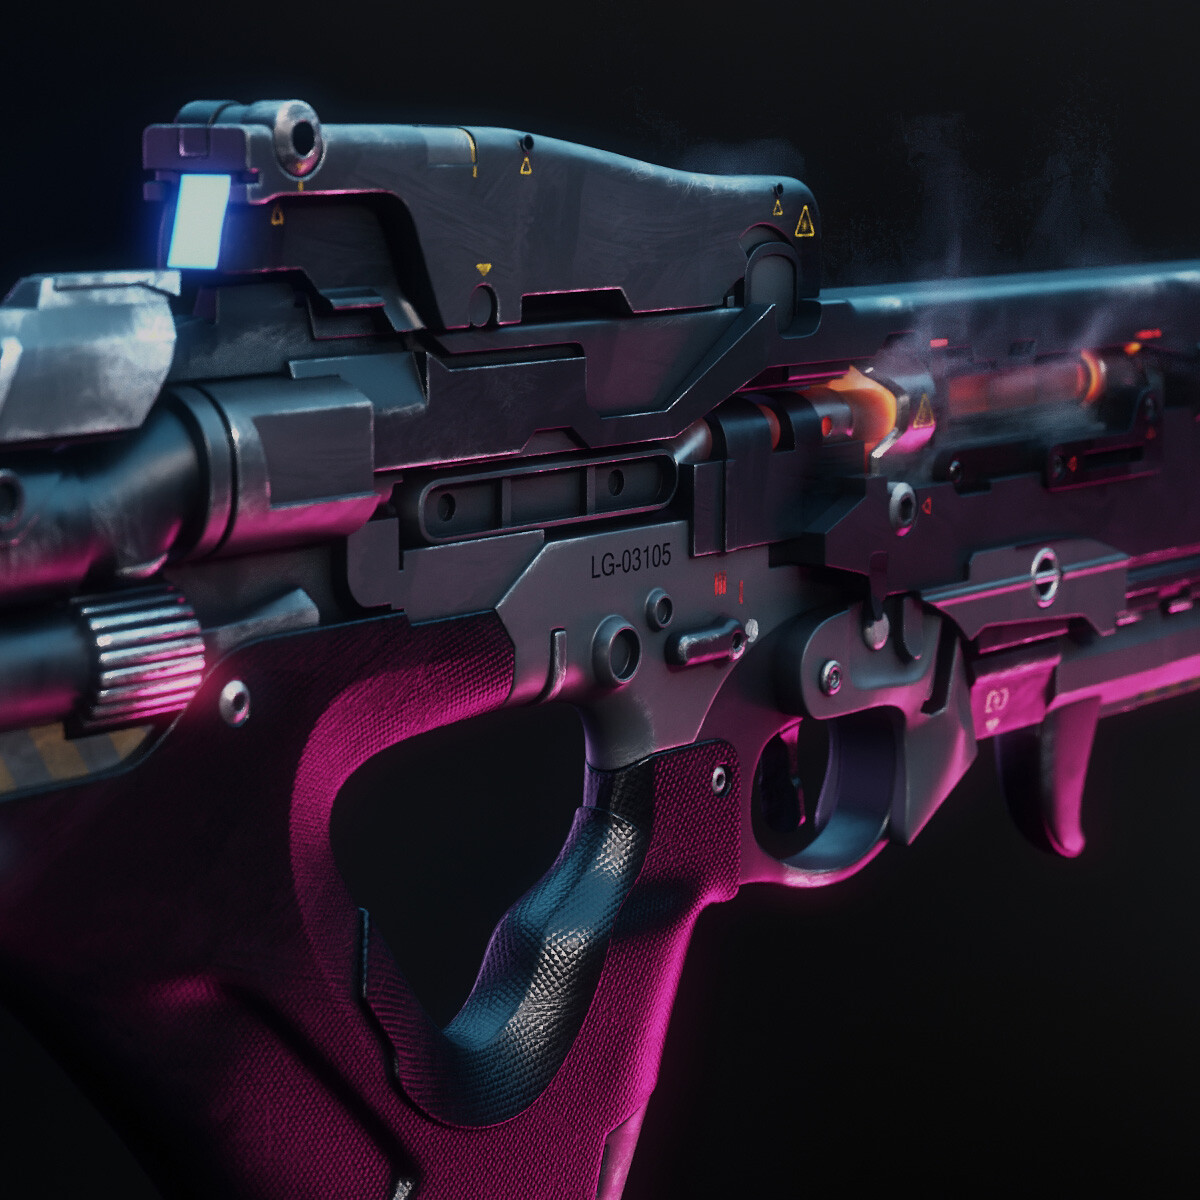 Battle Rifle - Modeling practice